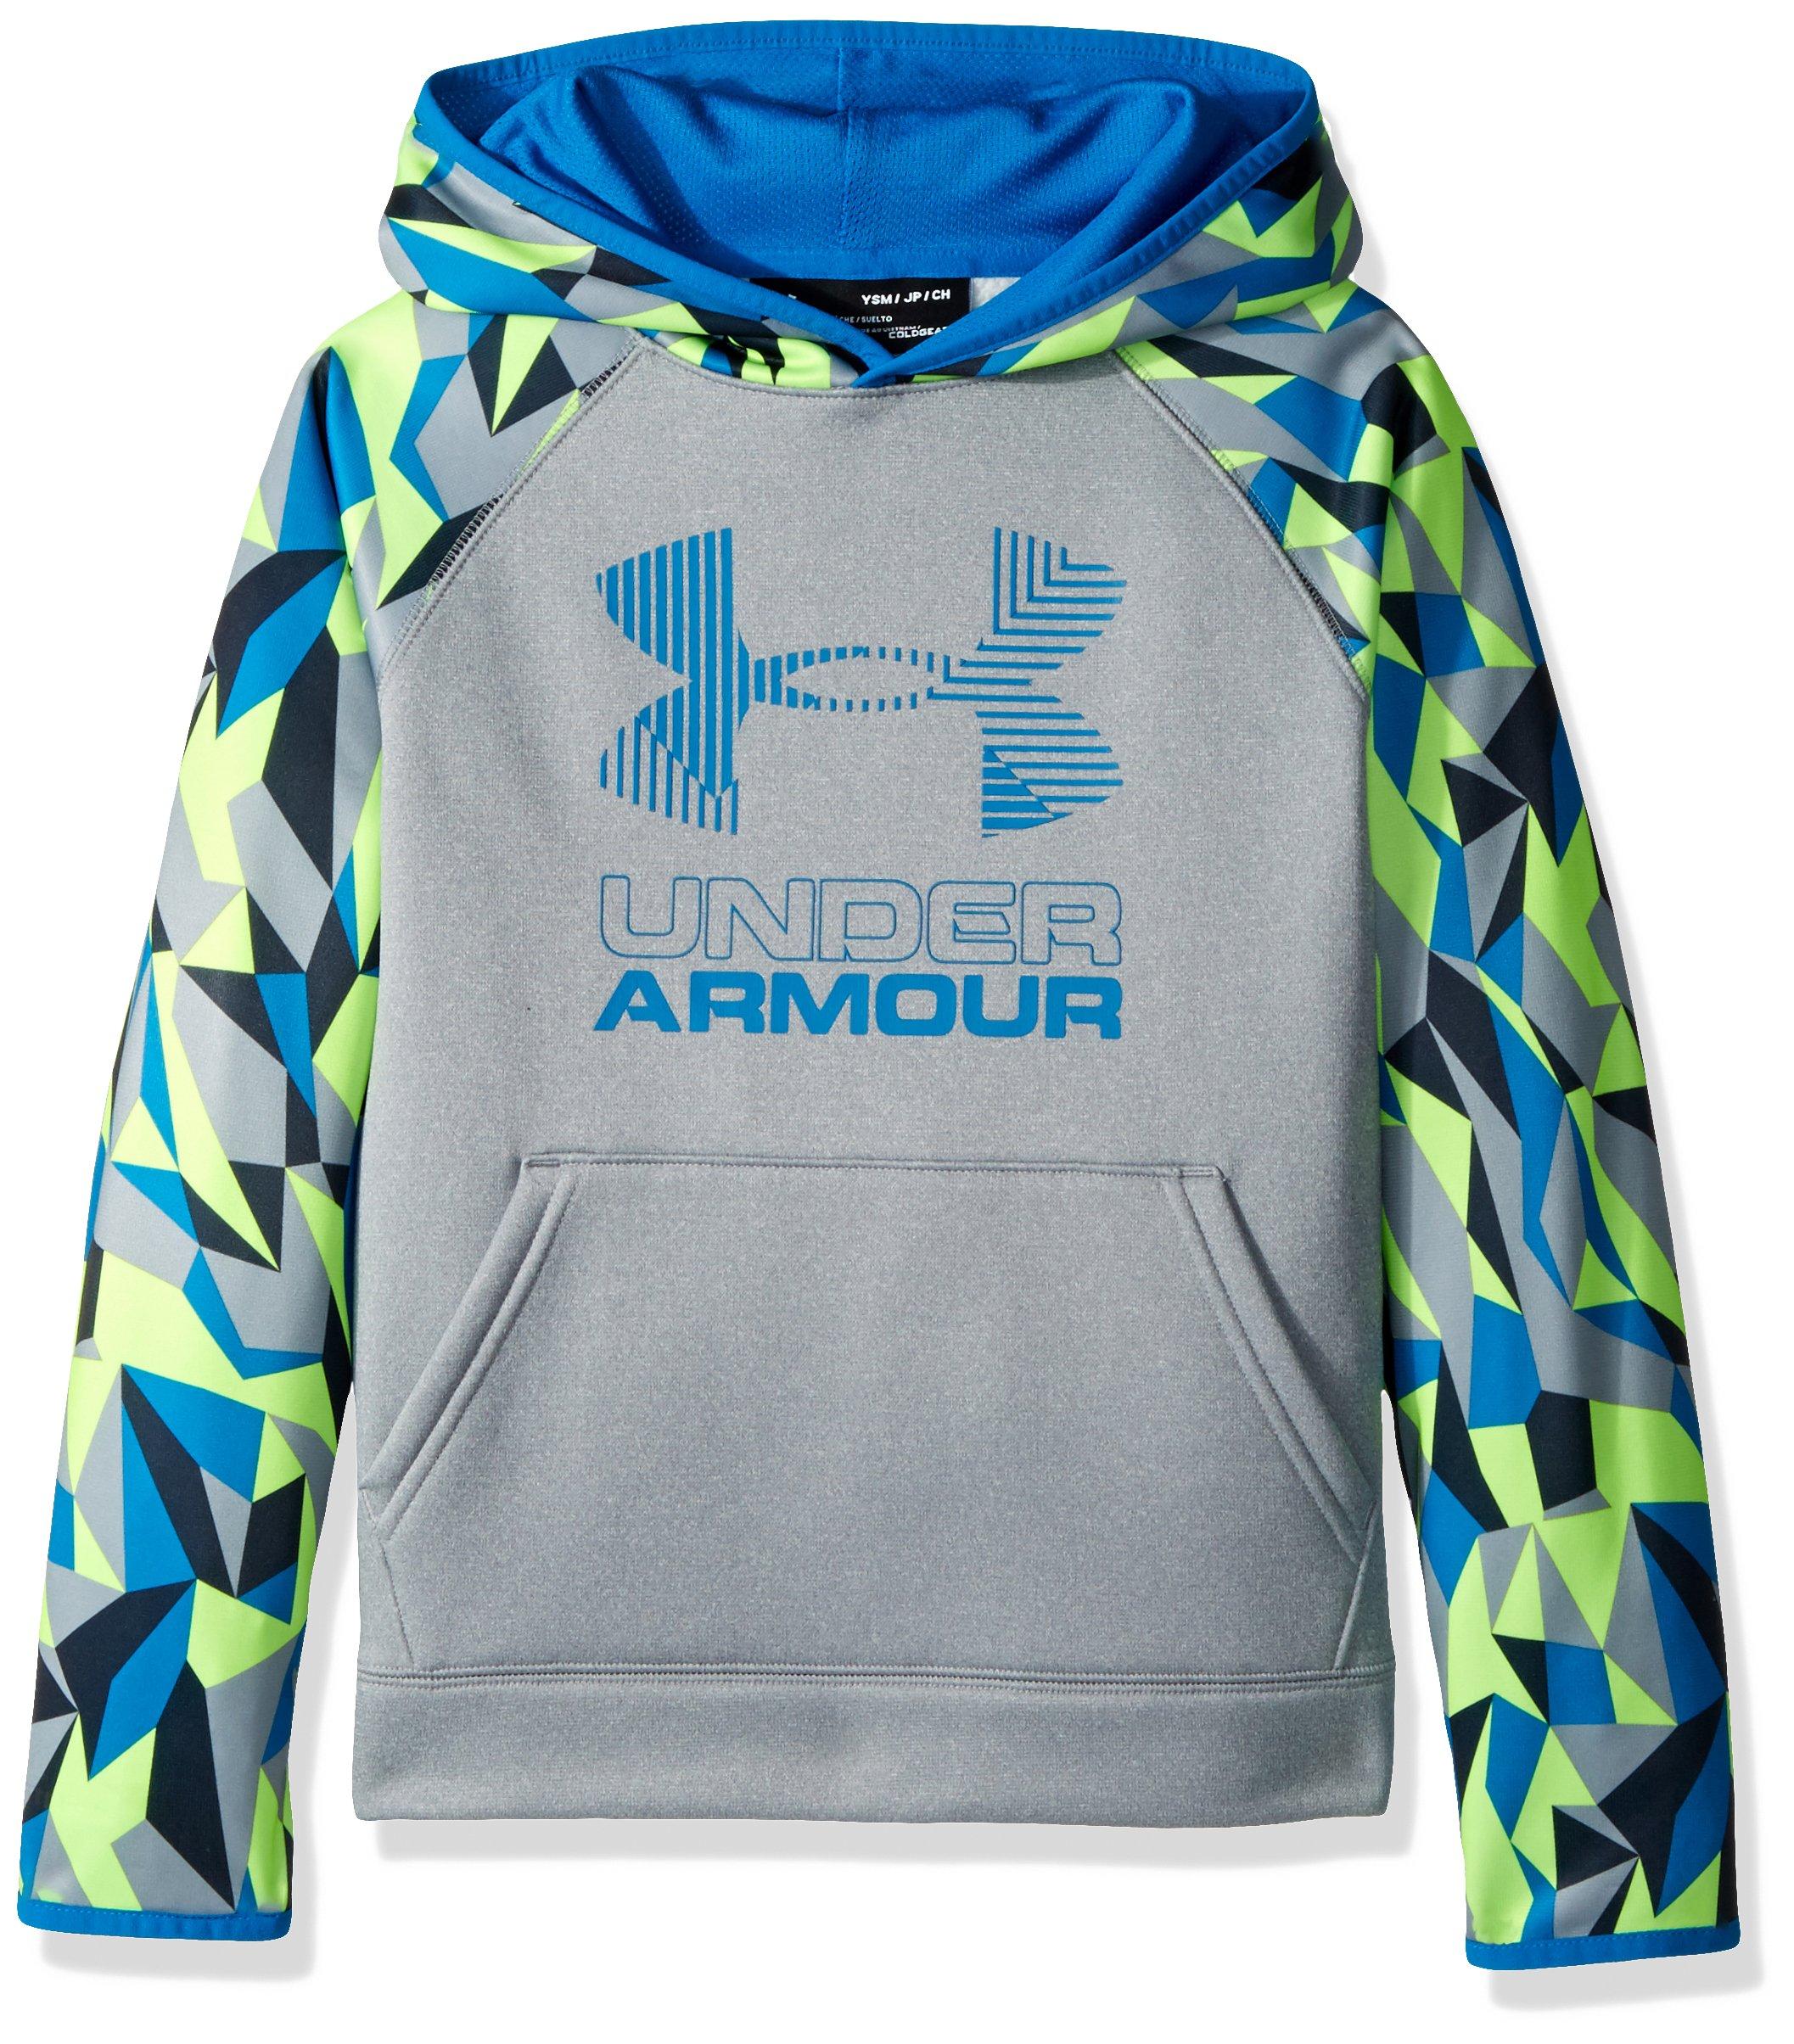 Under Armour Boys' Armour Fleece Printed Big Logo Hoodie, Steel Light Heather /Cruise Blue, Youth X-Small